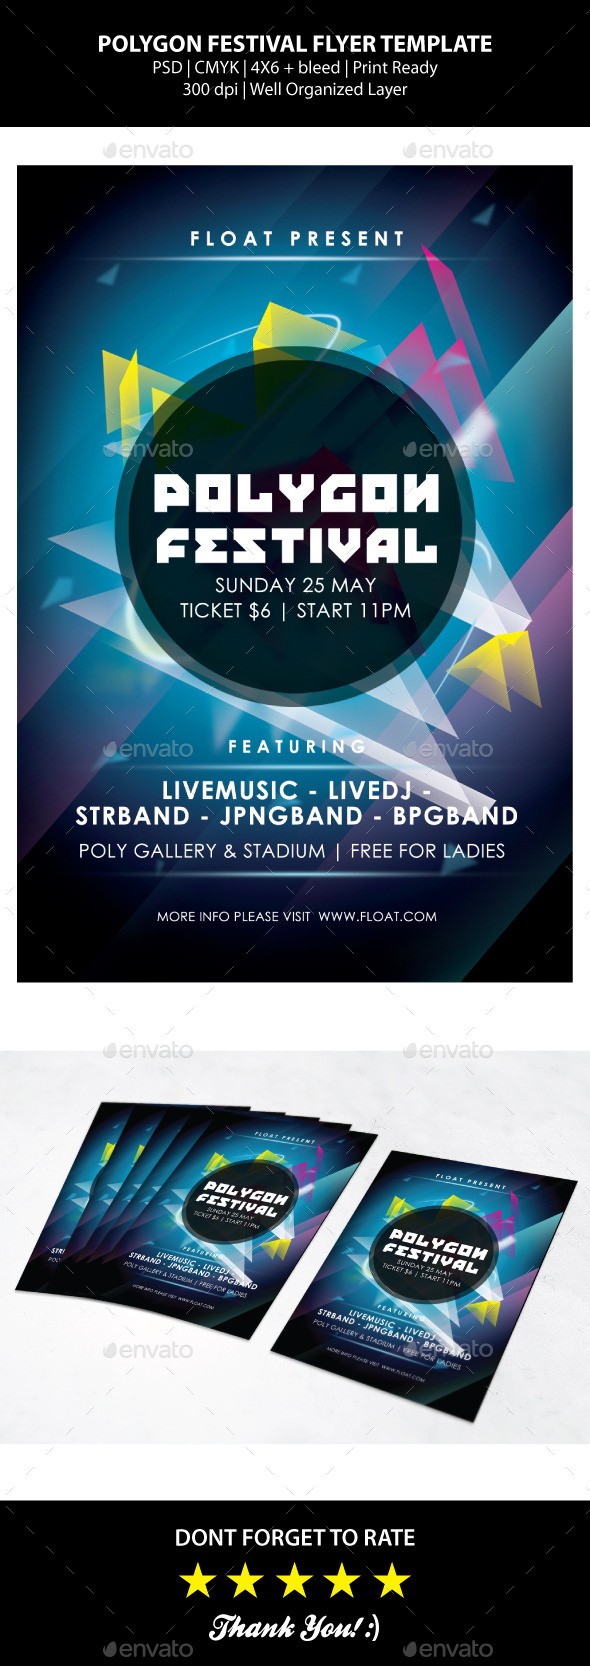 GraphicRiver Polygon Festival Flyer Templates 9375617